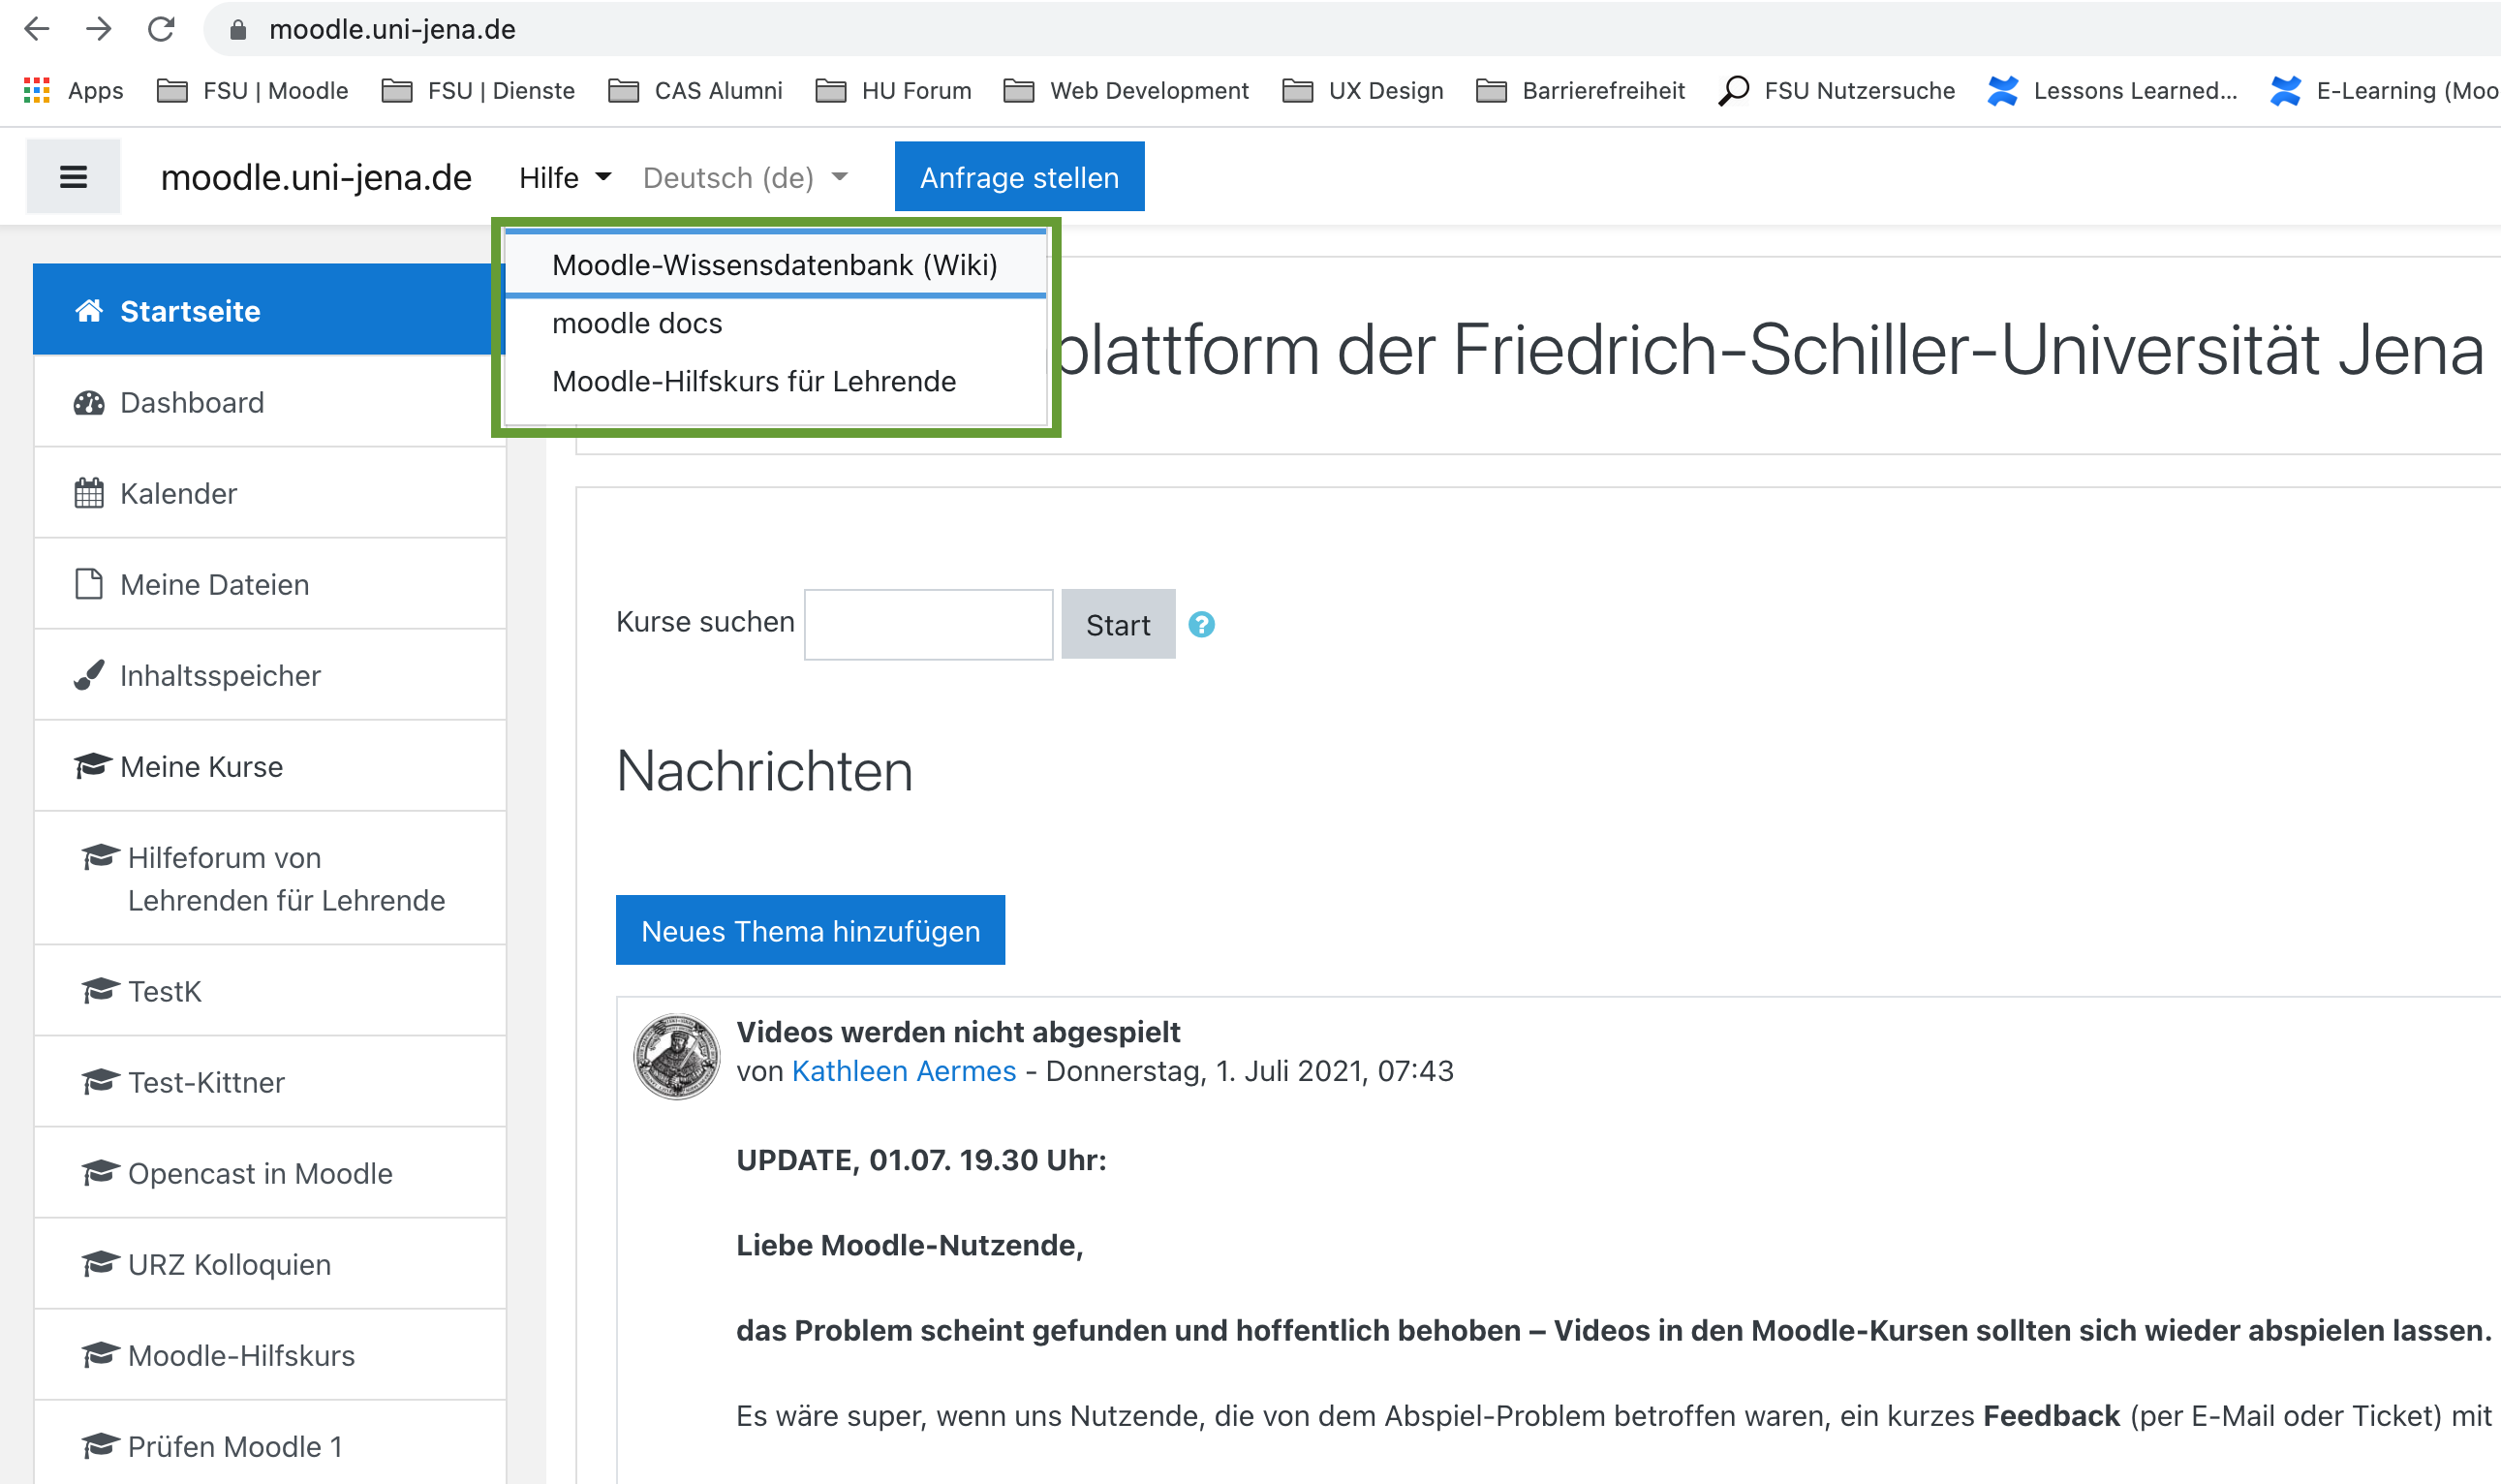 Hilfe-Menü auf moodle.uni-jena.de